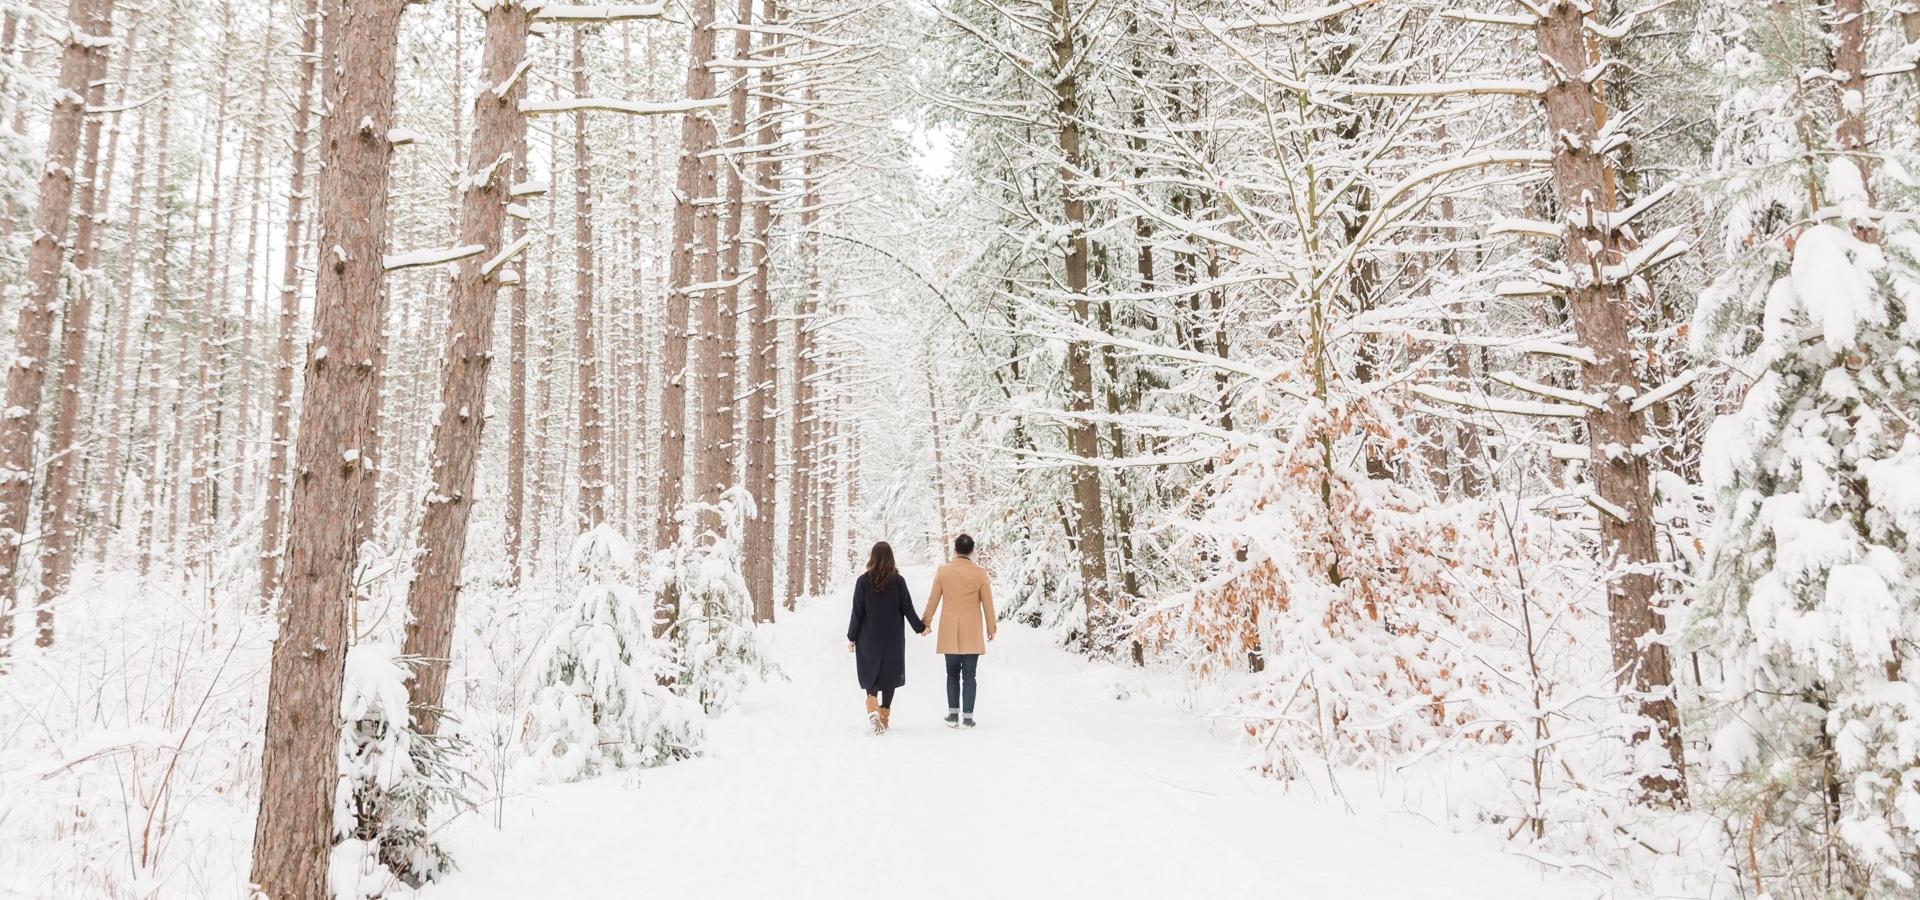 Hero image for Toronto Wedding Photographers Showcase the Beauty of Winter Photography